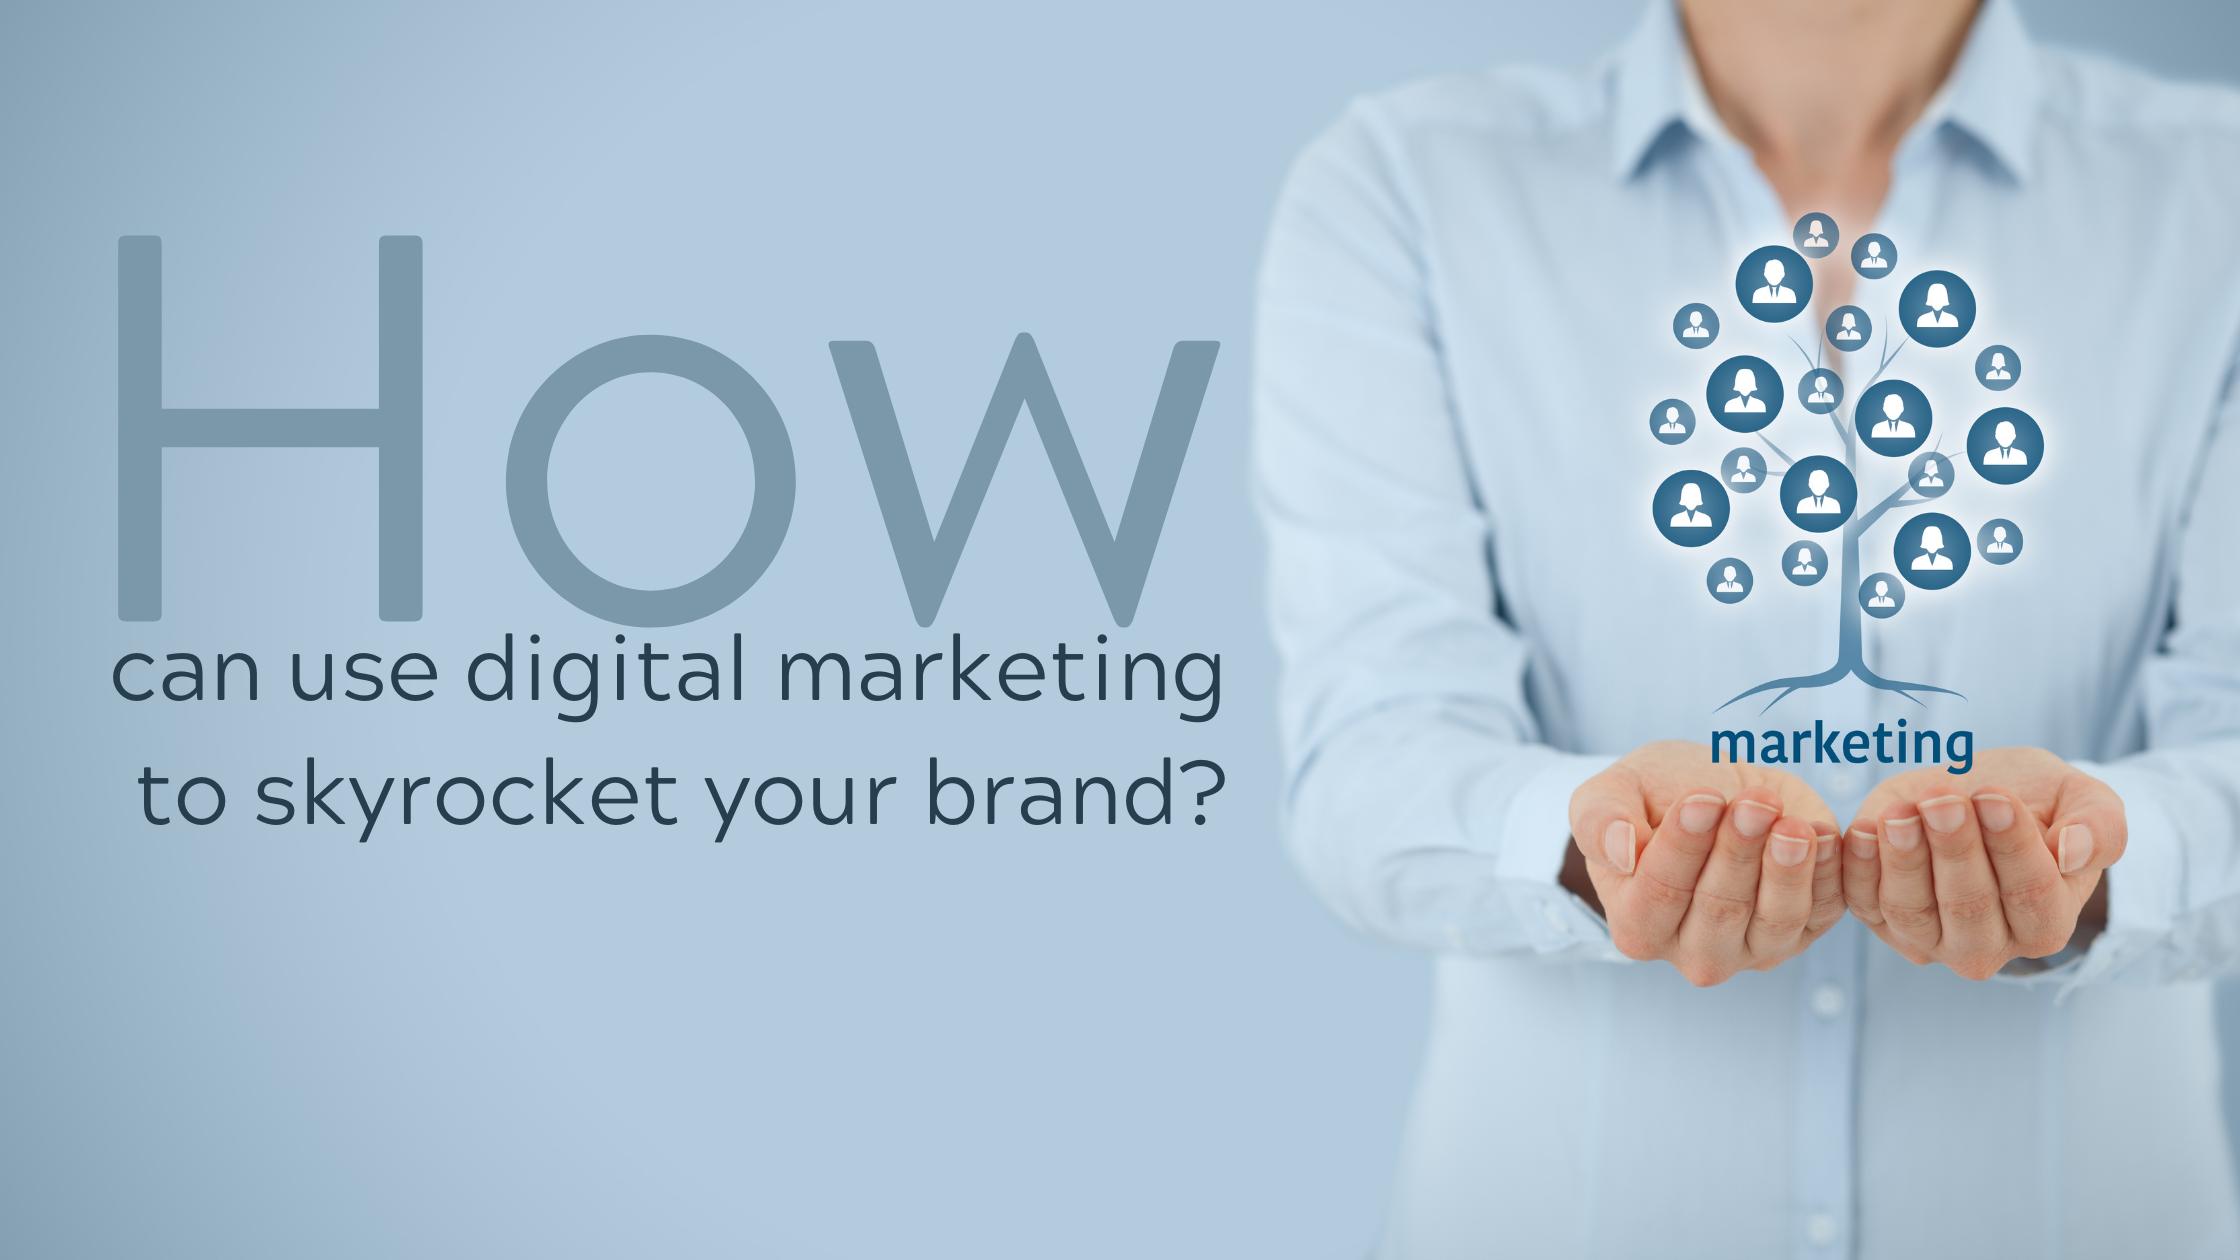 Using digital marketing to skyrocket your brand?